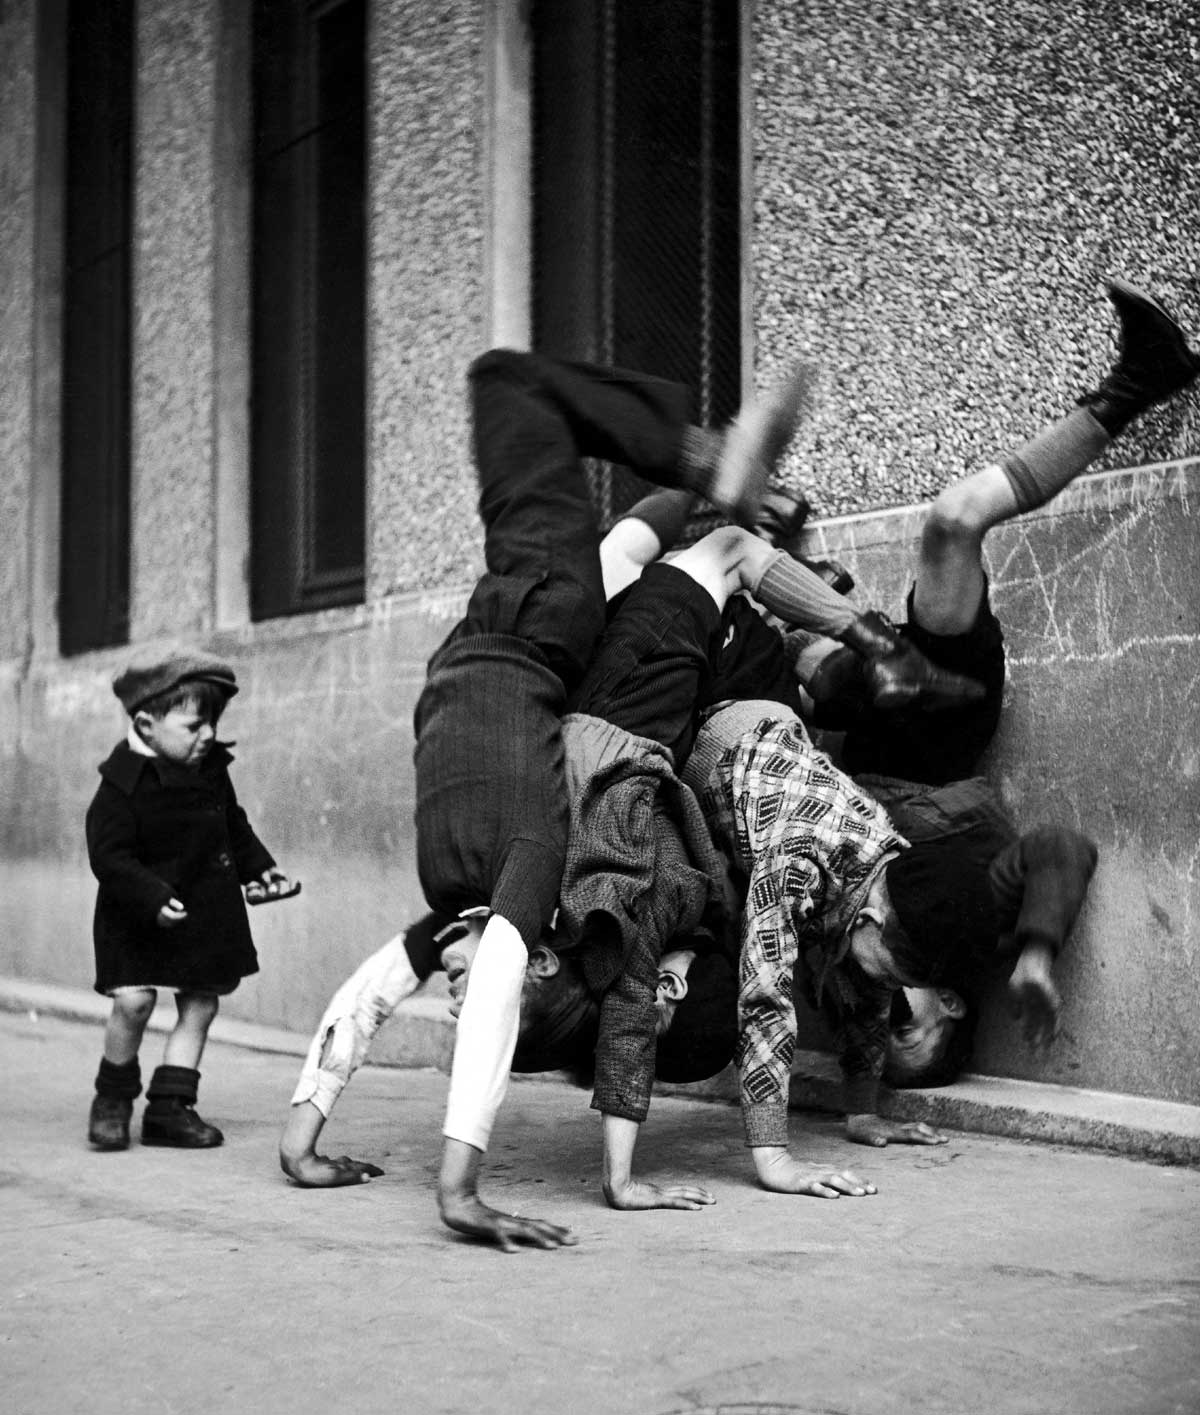 Doisneau - Feet on the wall, 1934